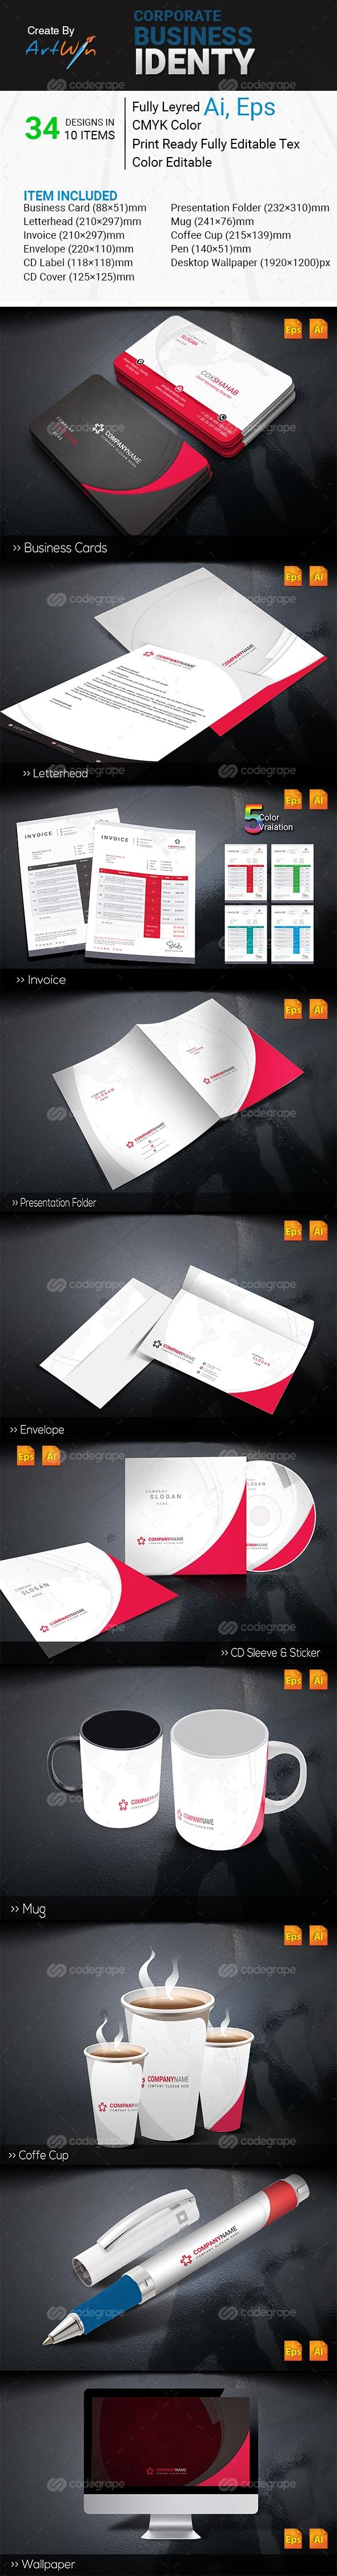 Corporate Business Identity